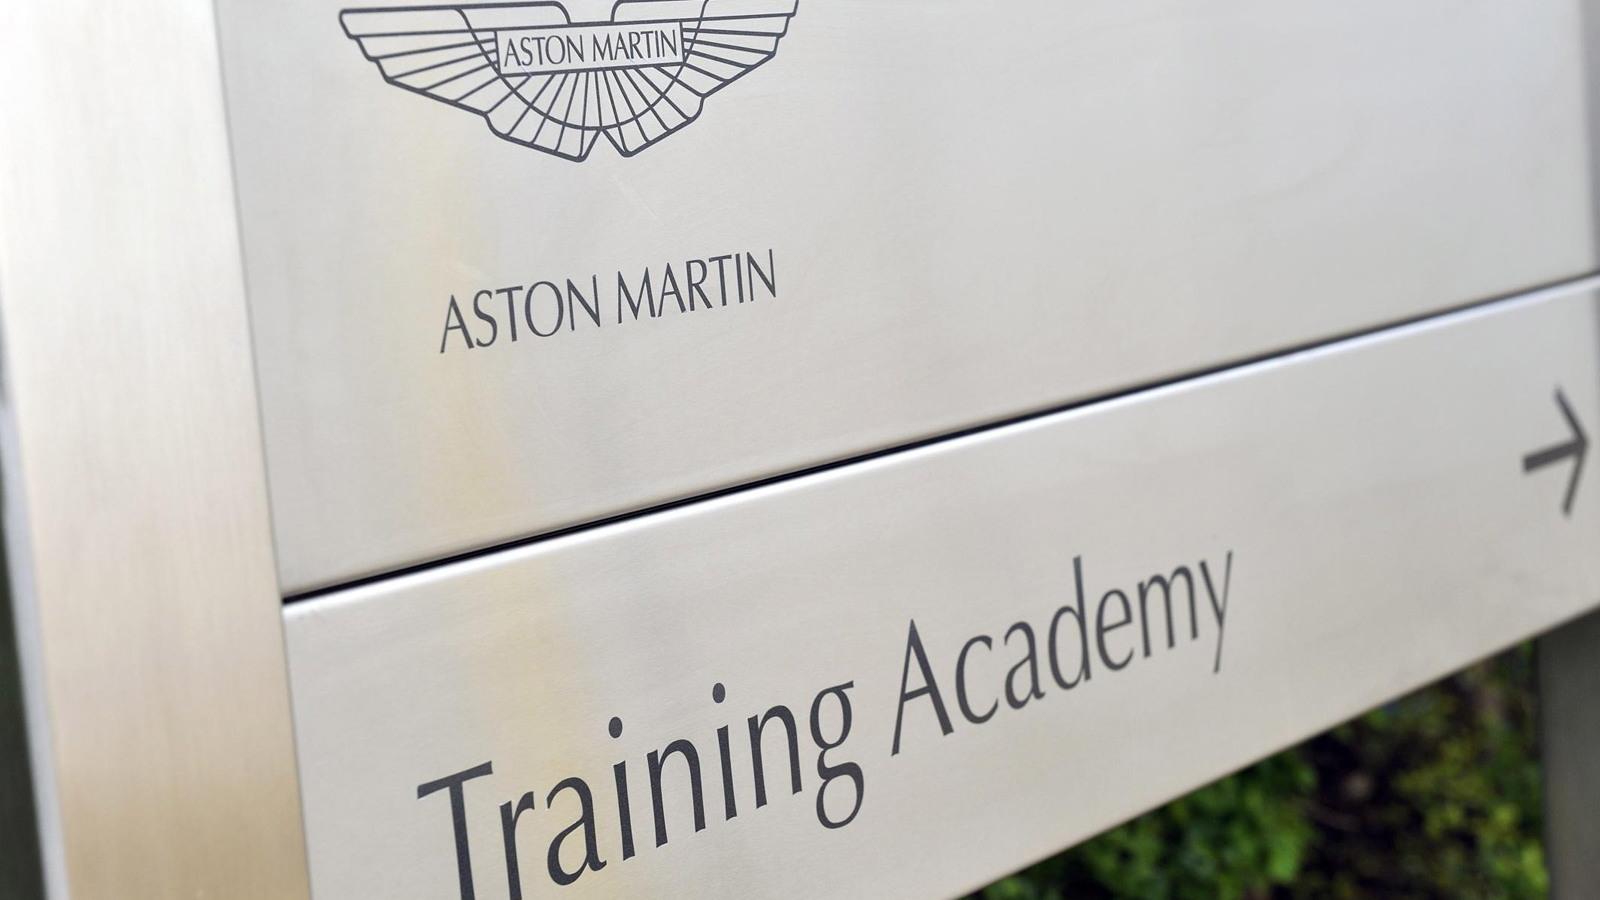 Aston Martin production facility in Gaydon, England